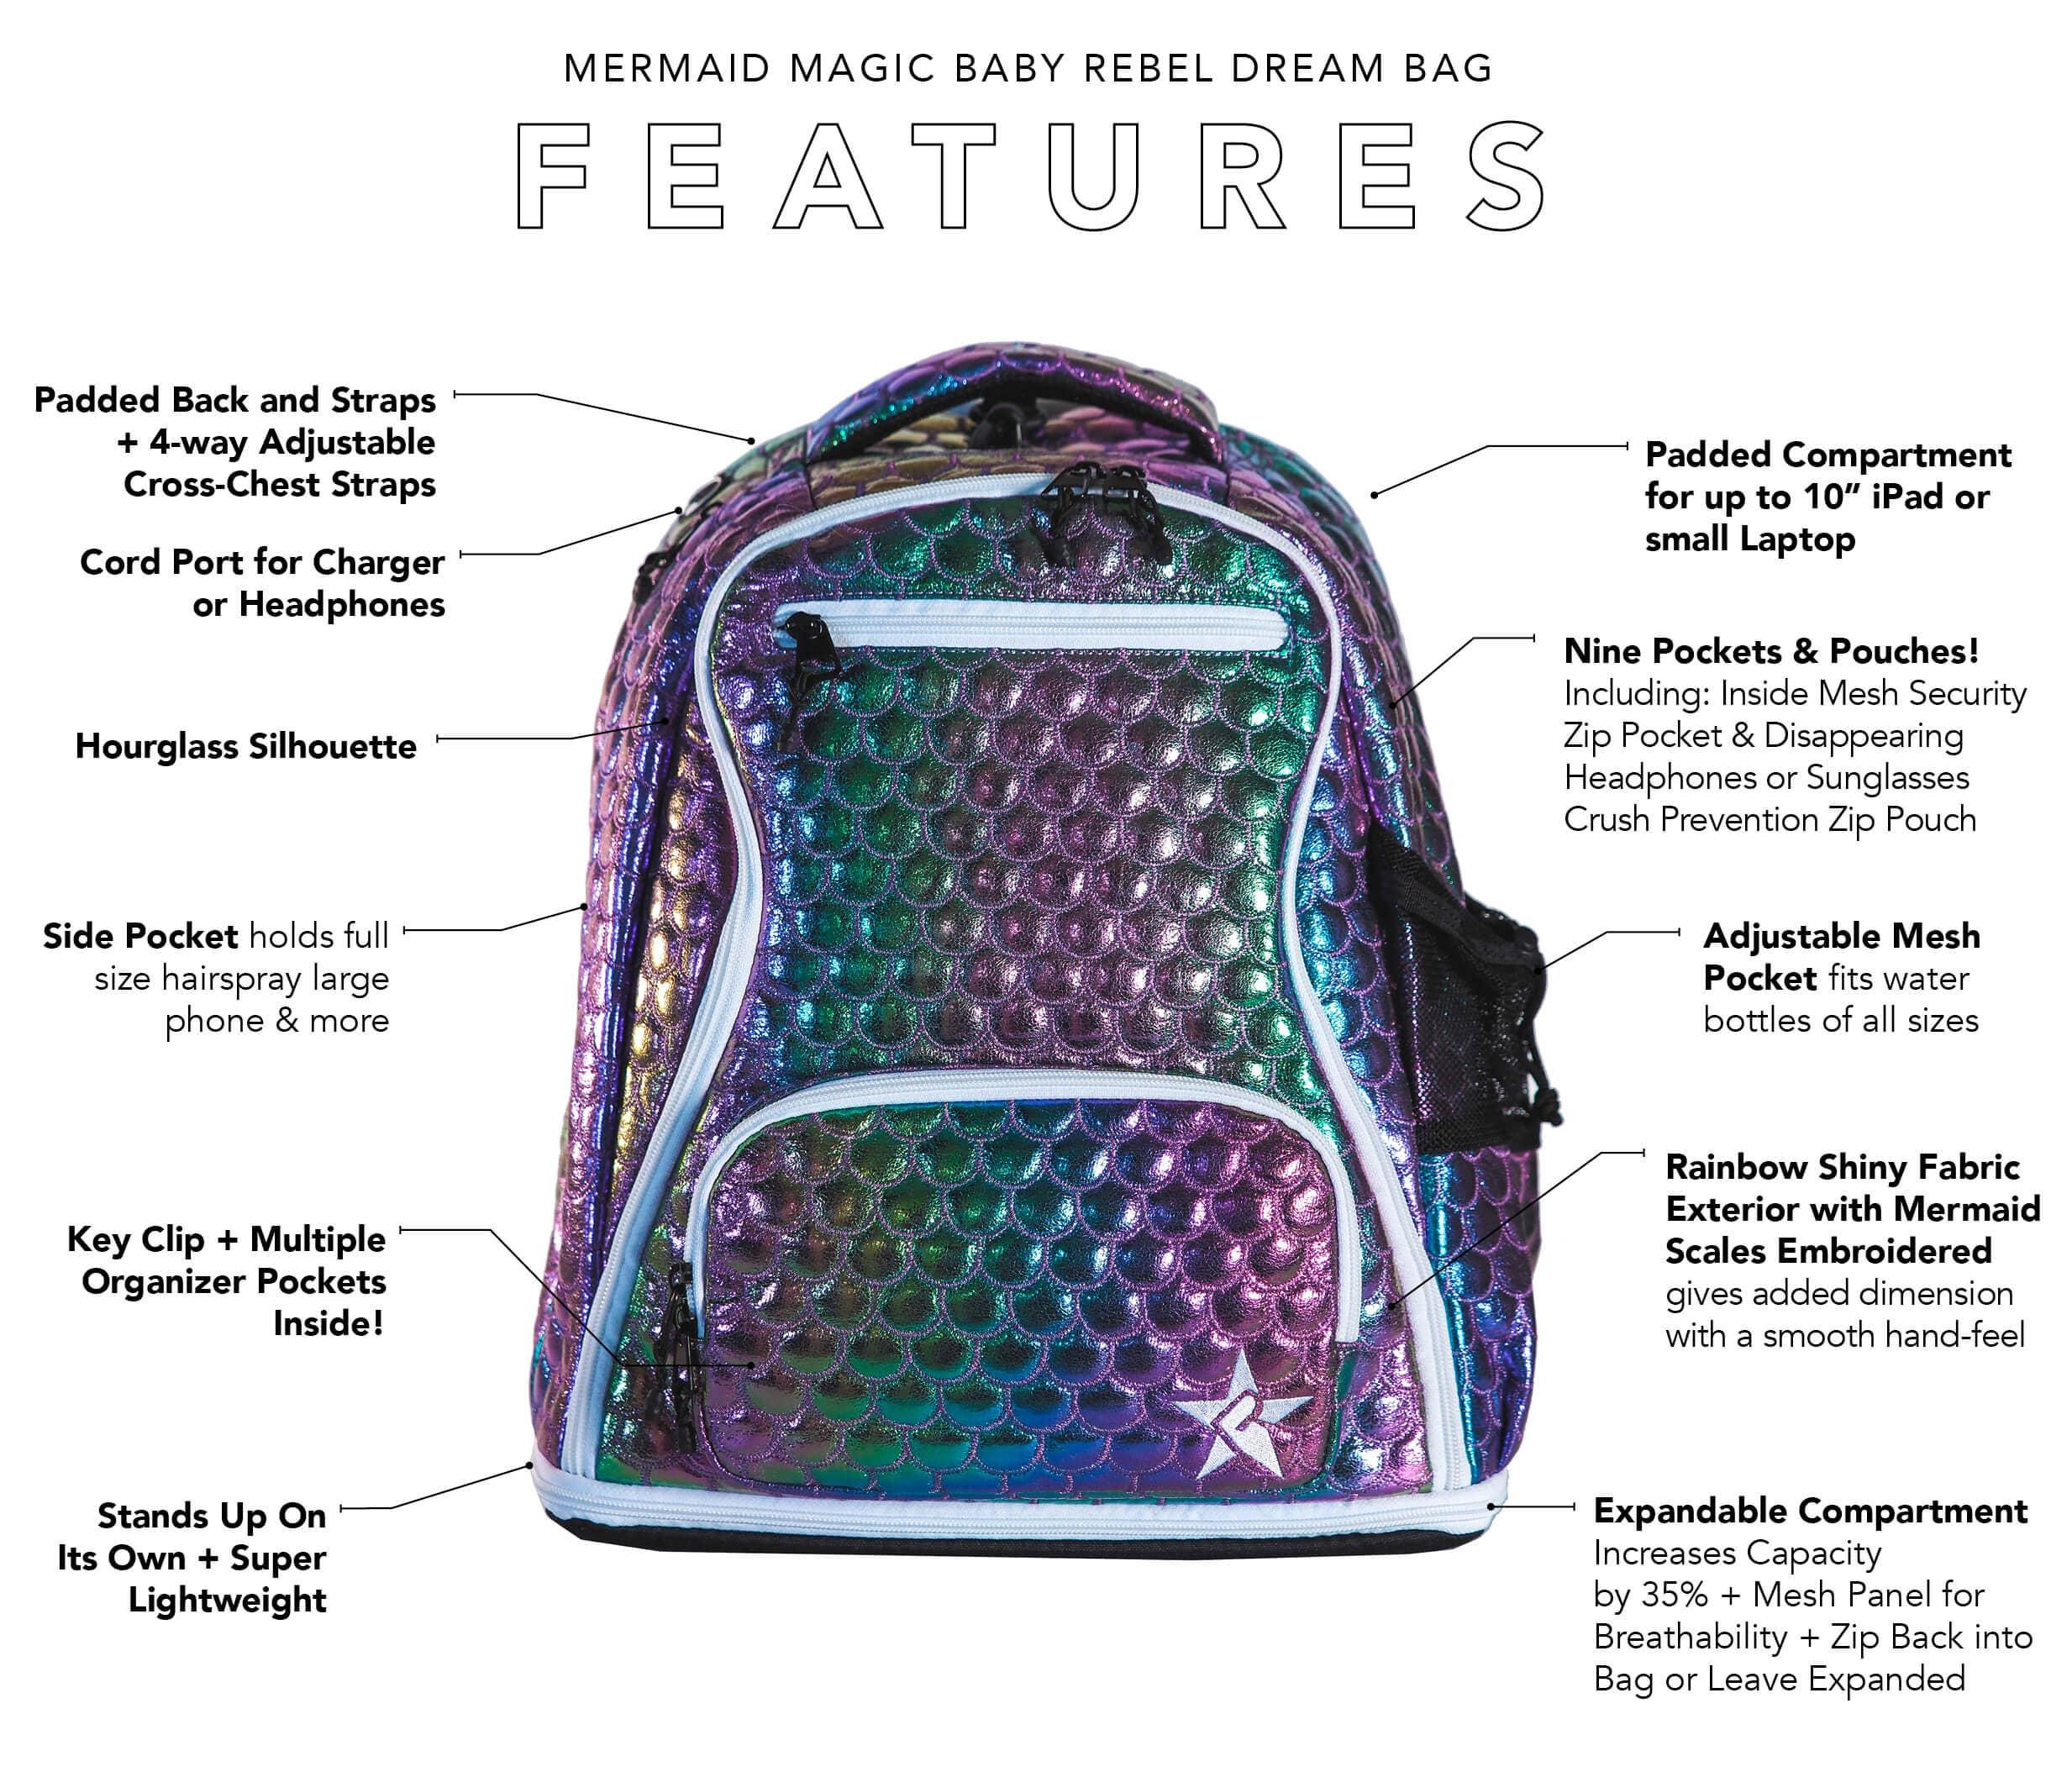 girls mermaid mini cheer bag main features